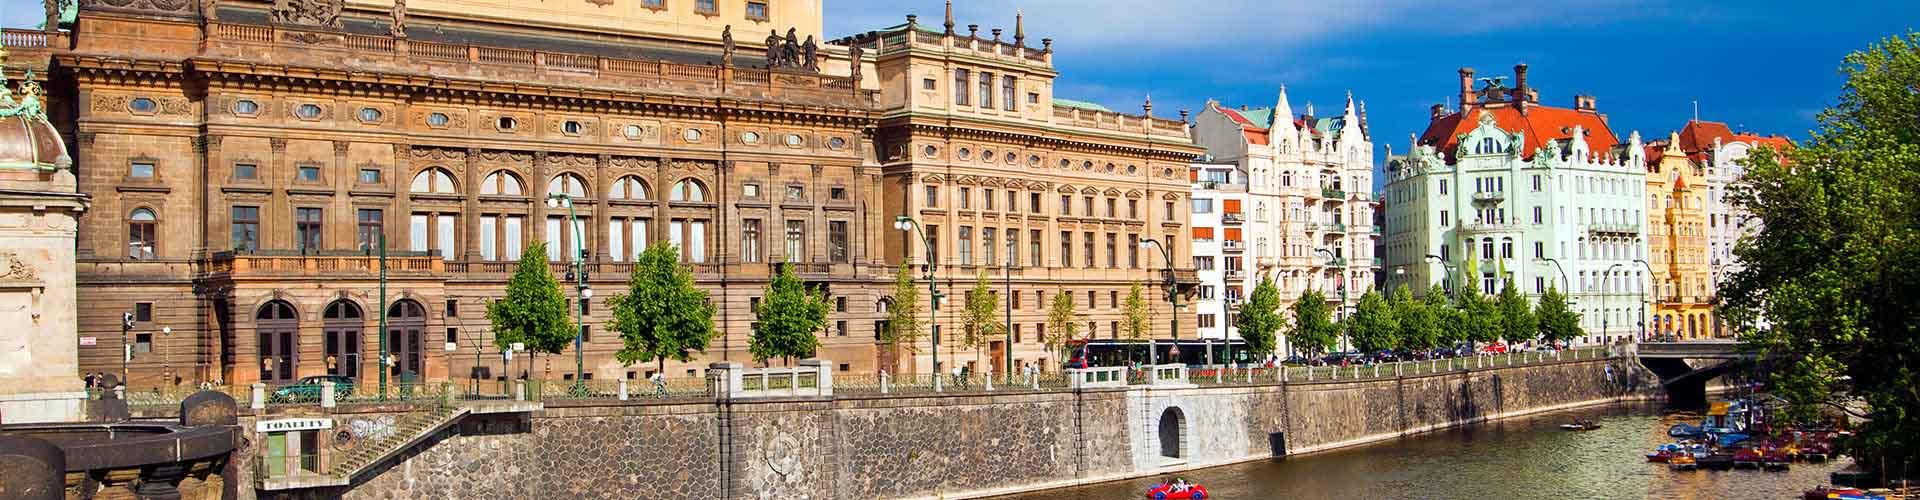 Praga - Hoteles baratos cerca a Teatro Nacional. Mapas de Praga, Fotos y comentarios de cada Hotel en Praga.